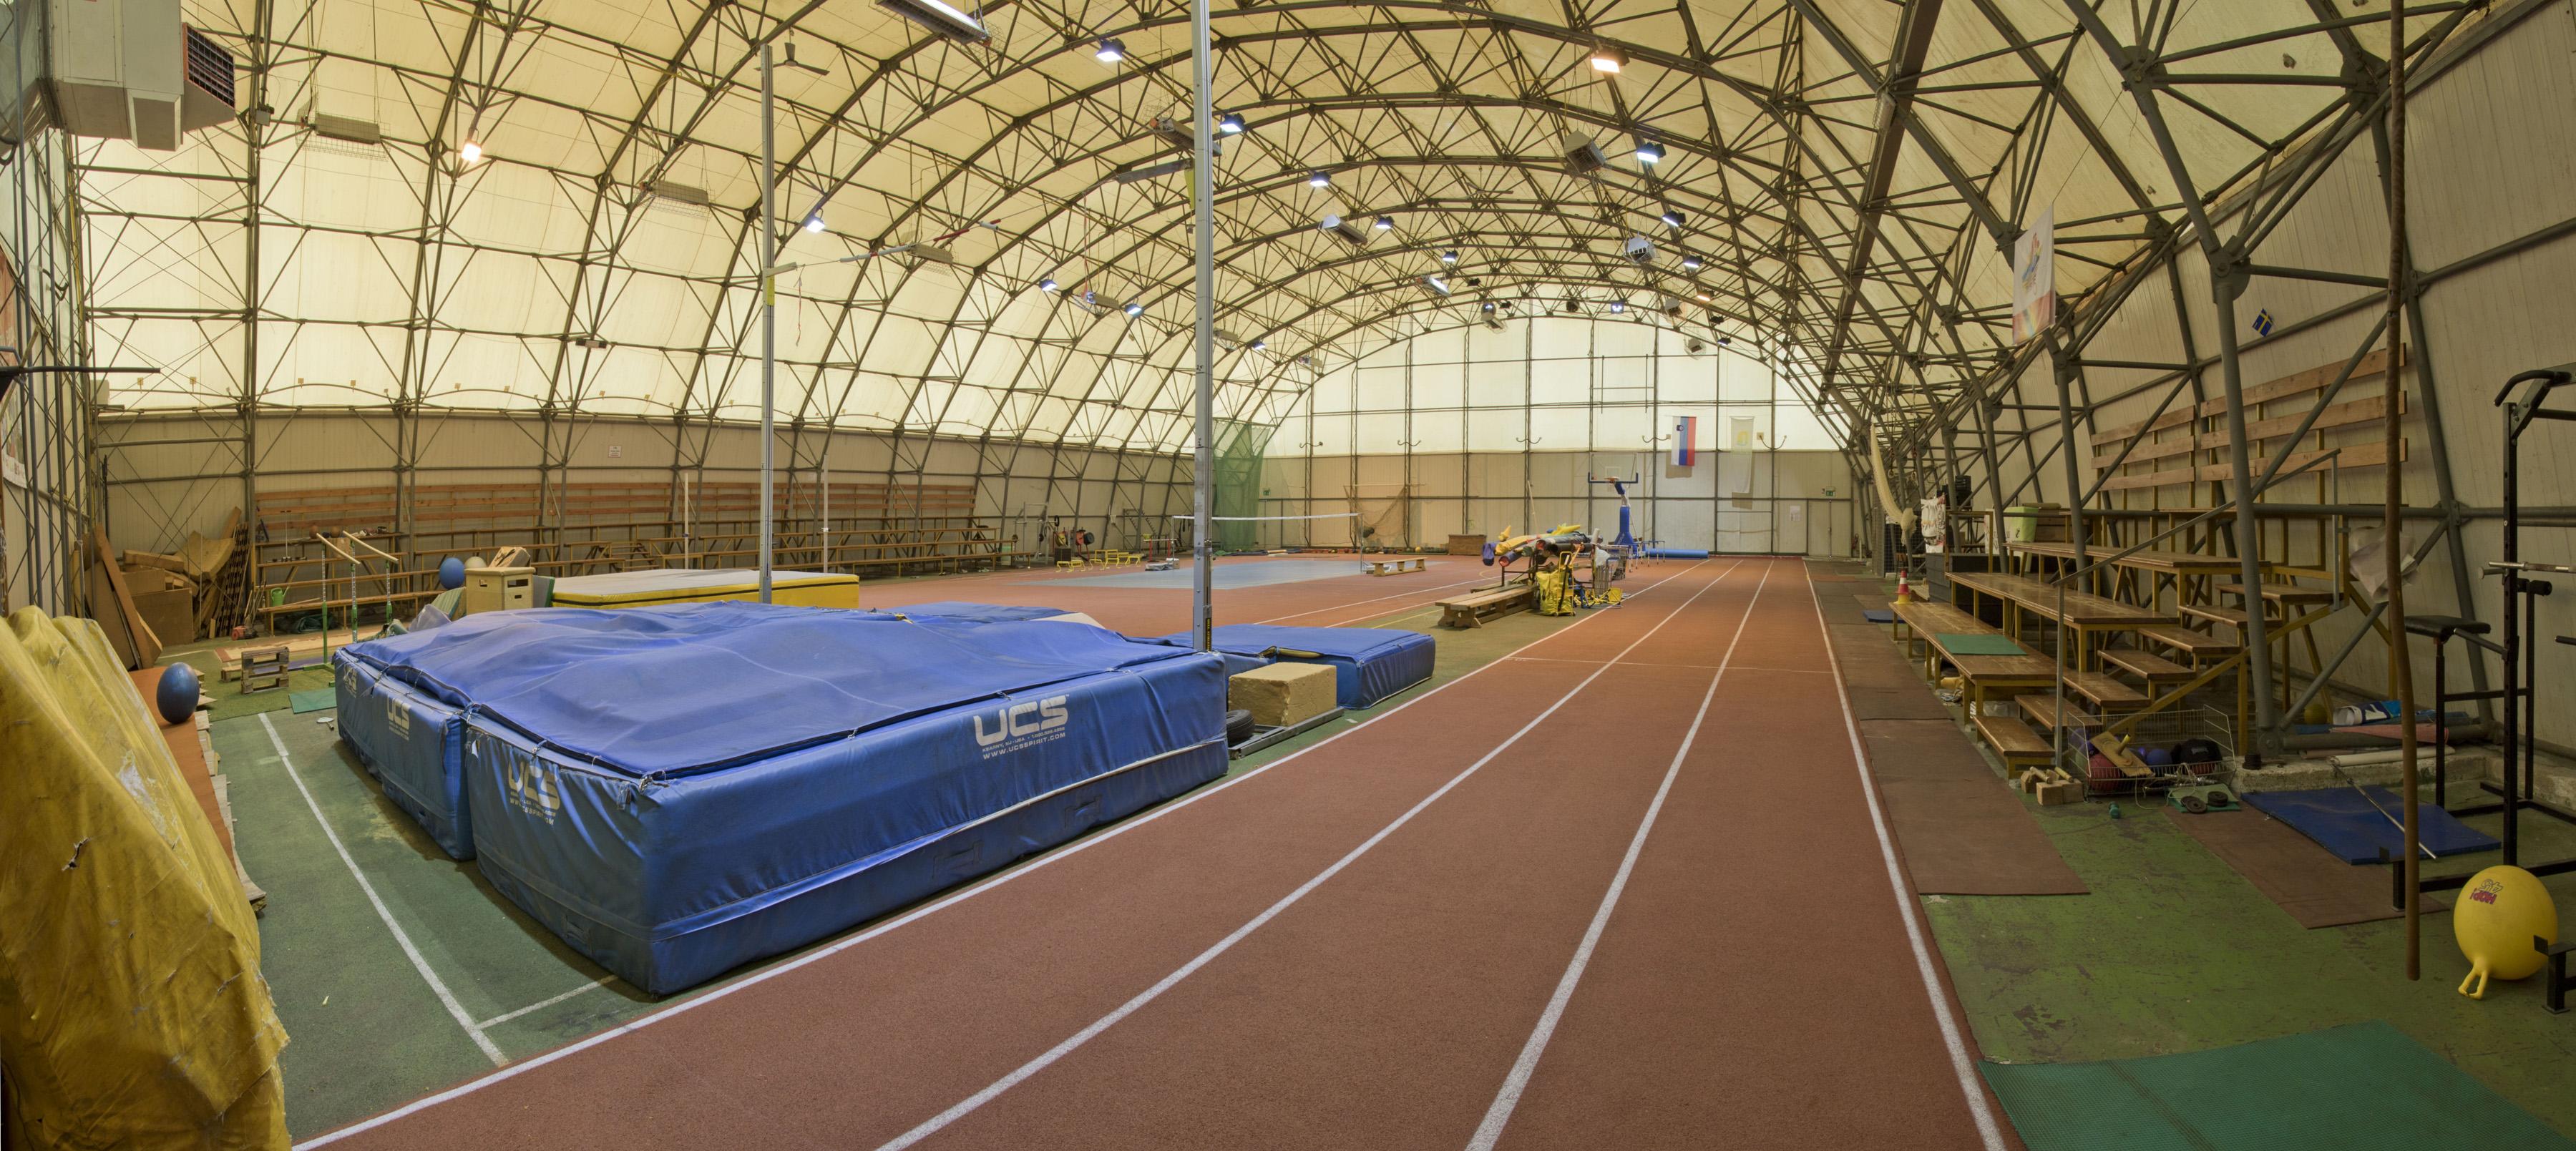 Atletska pokrita dvorana – Balon Brežice